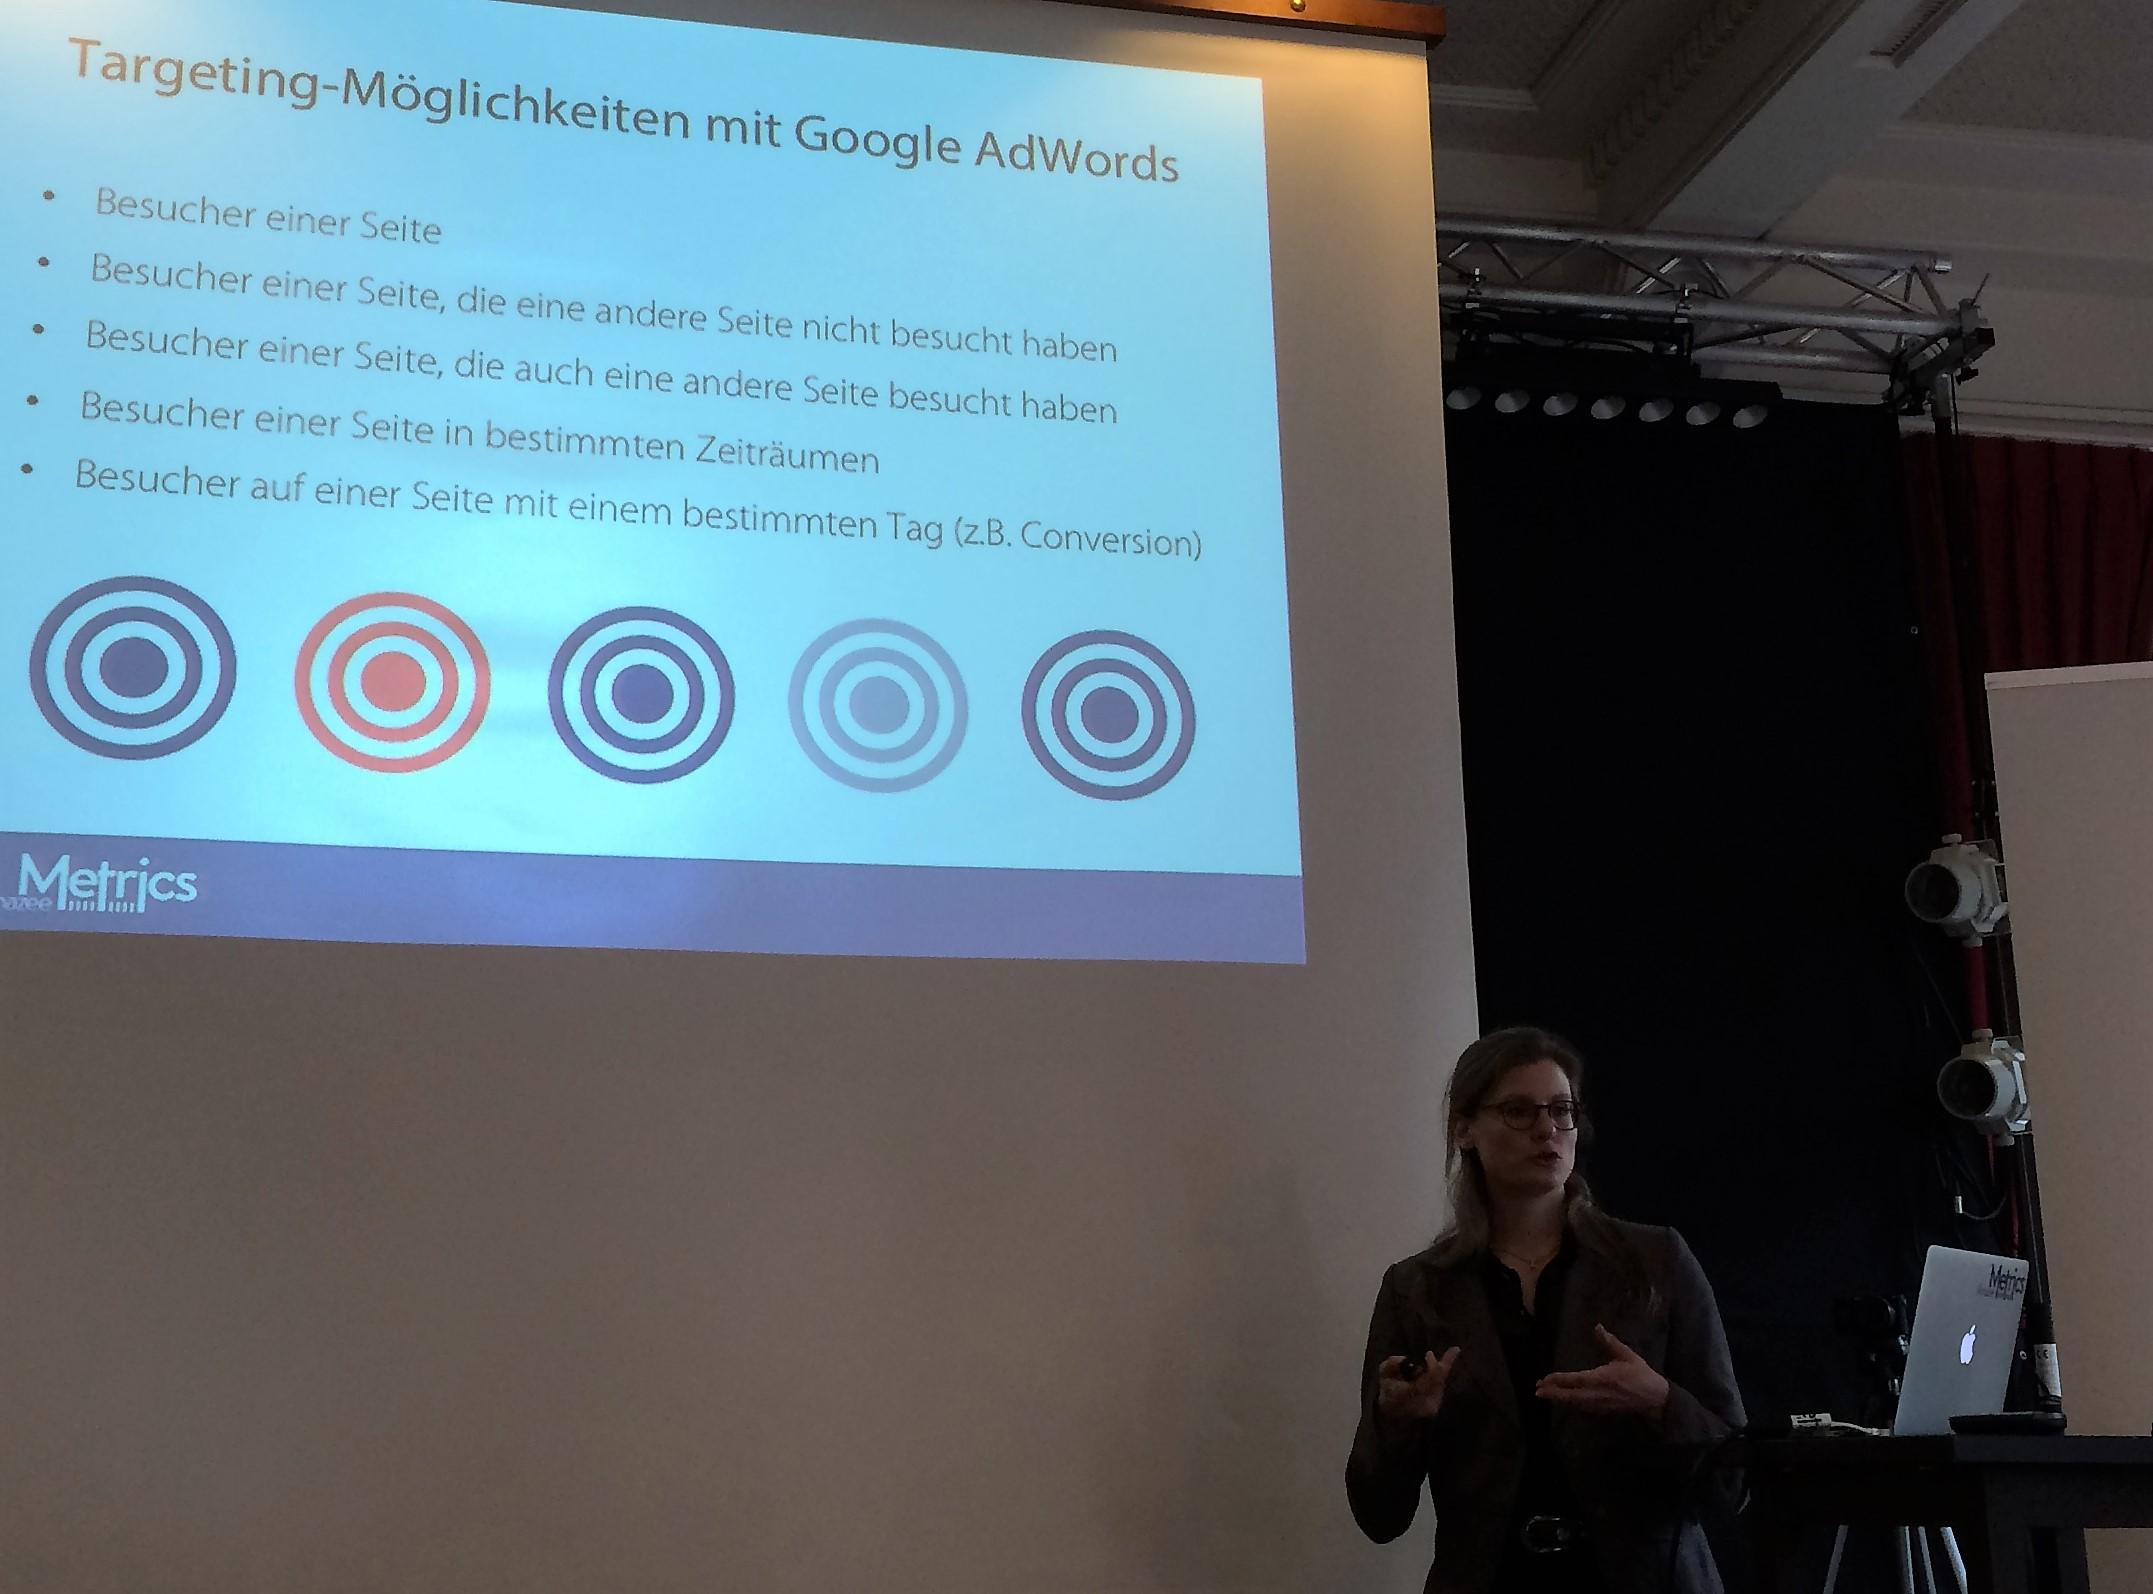 Targeting mit AdWords